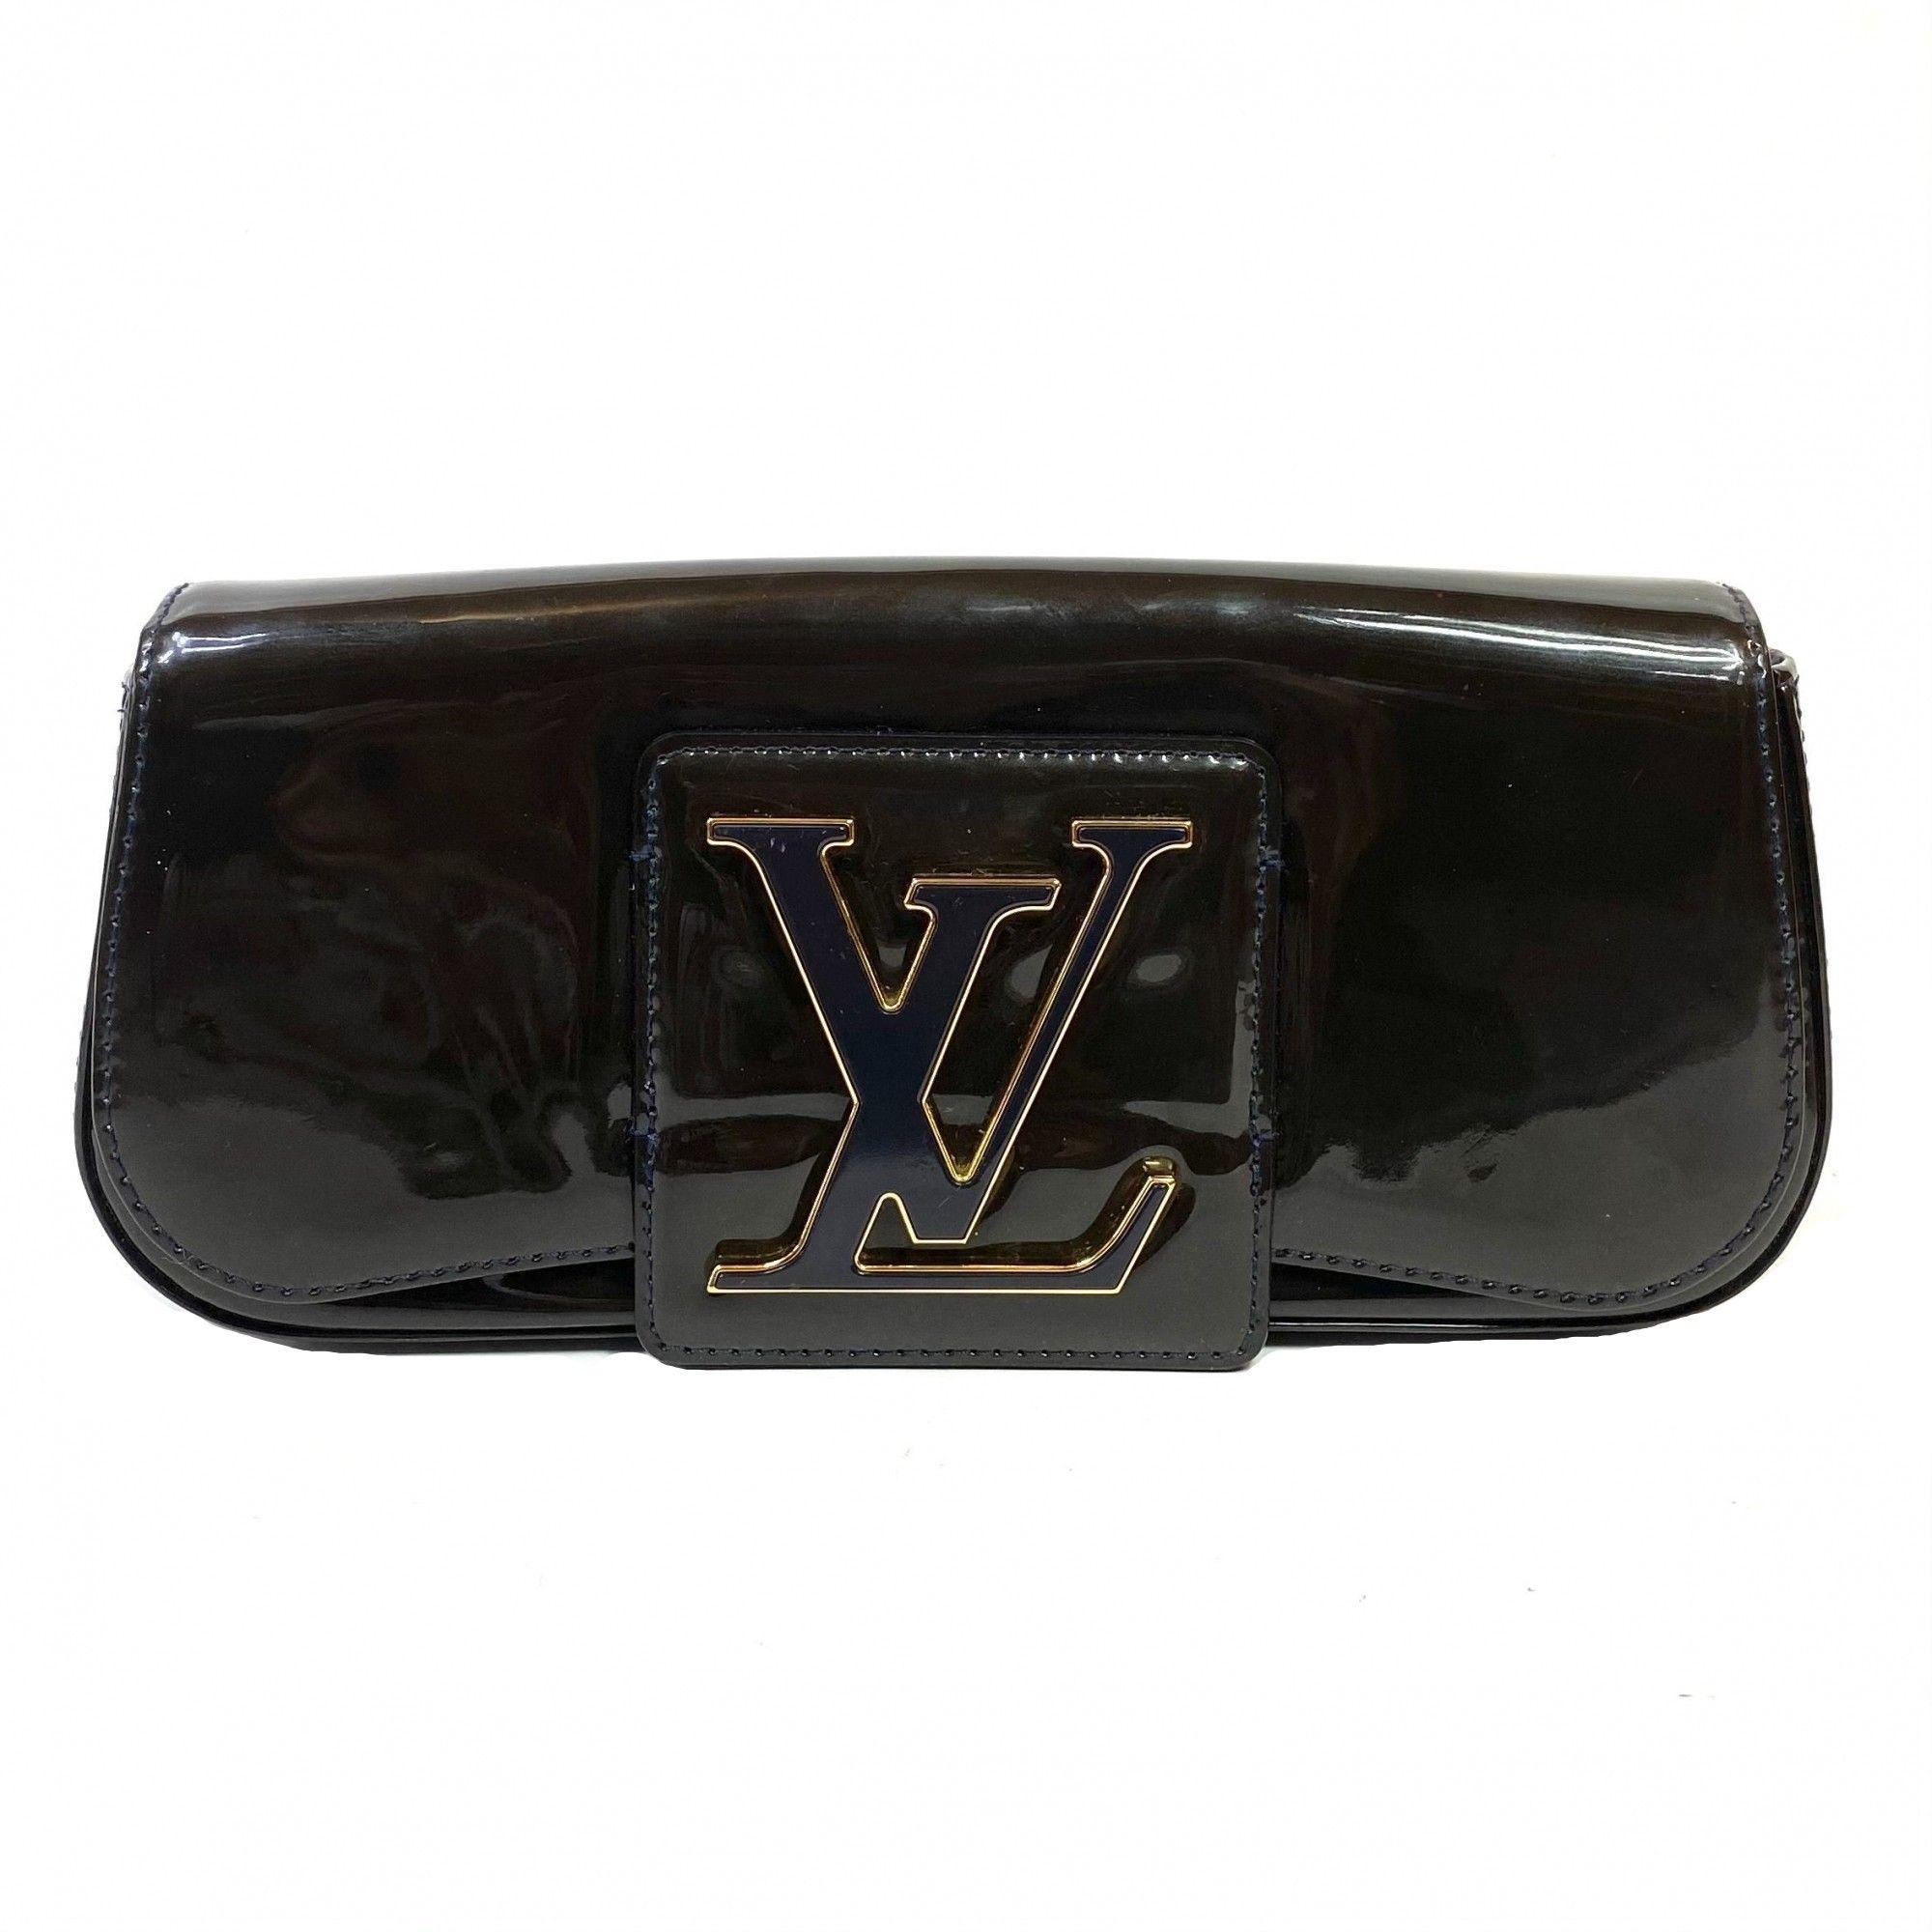 Bolsa Clutch Louis Vuitton Sobe Verniz Marinho